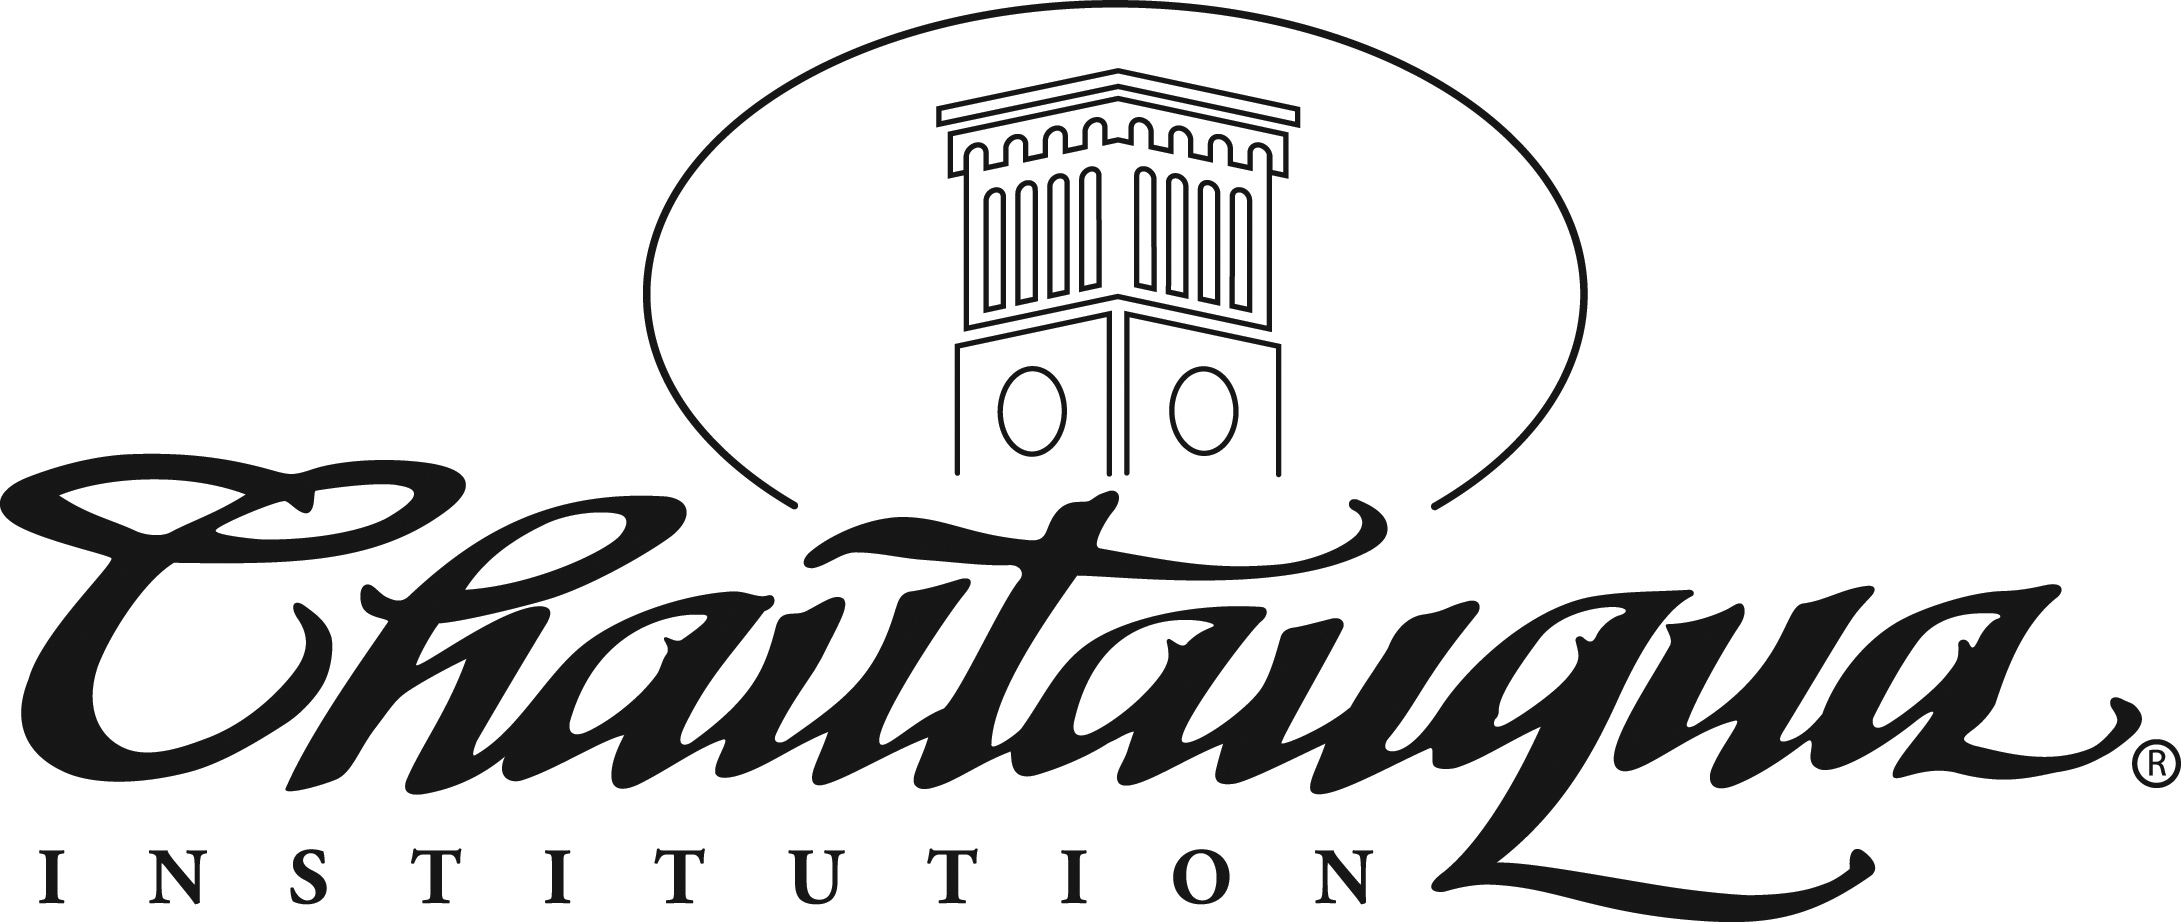 chautauqua logo_large.jpg